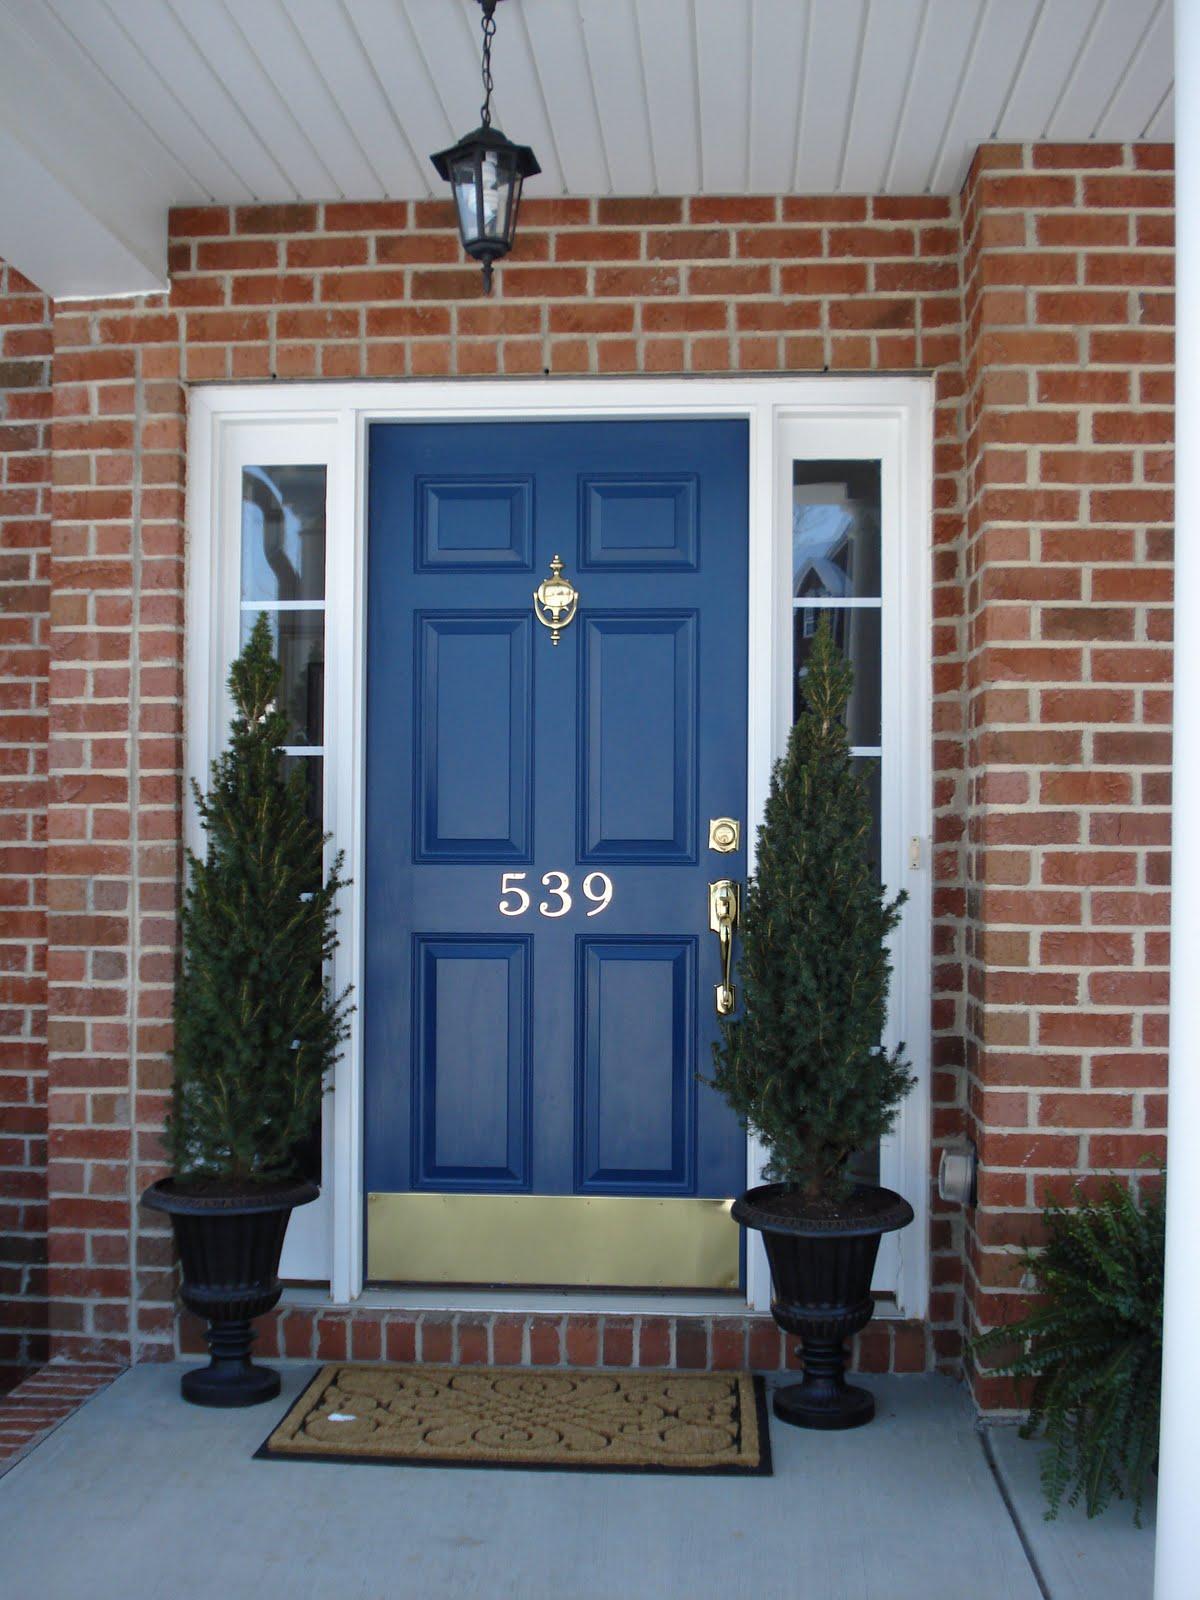 Greatest Thieves on the doorstep? - Edgeville Buzz VJ41